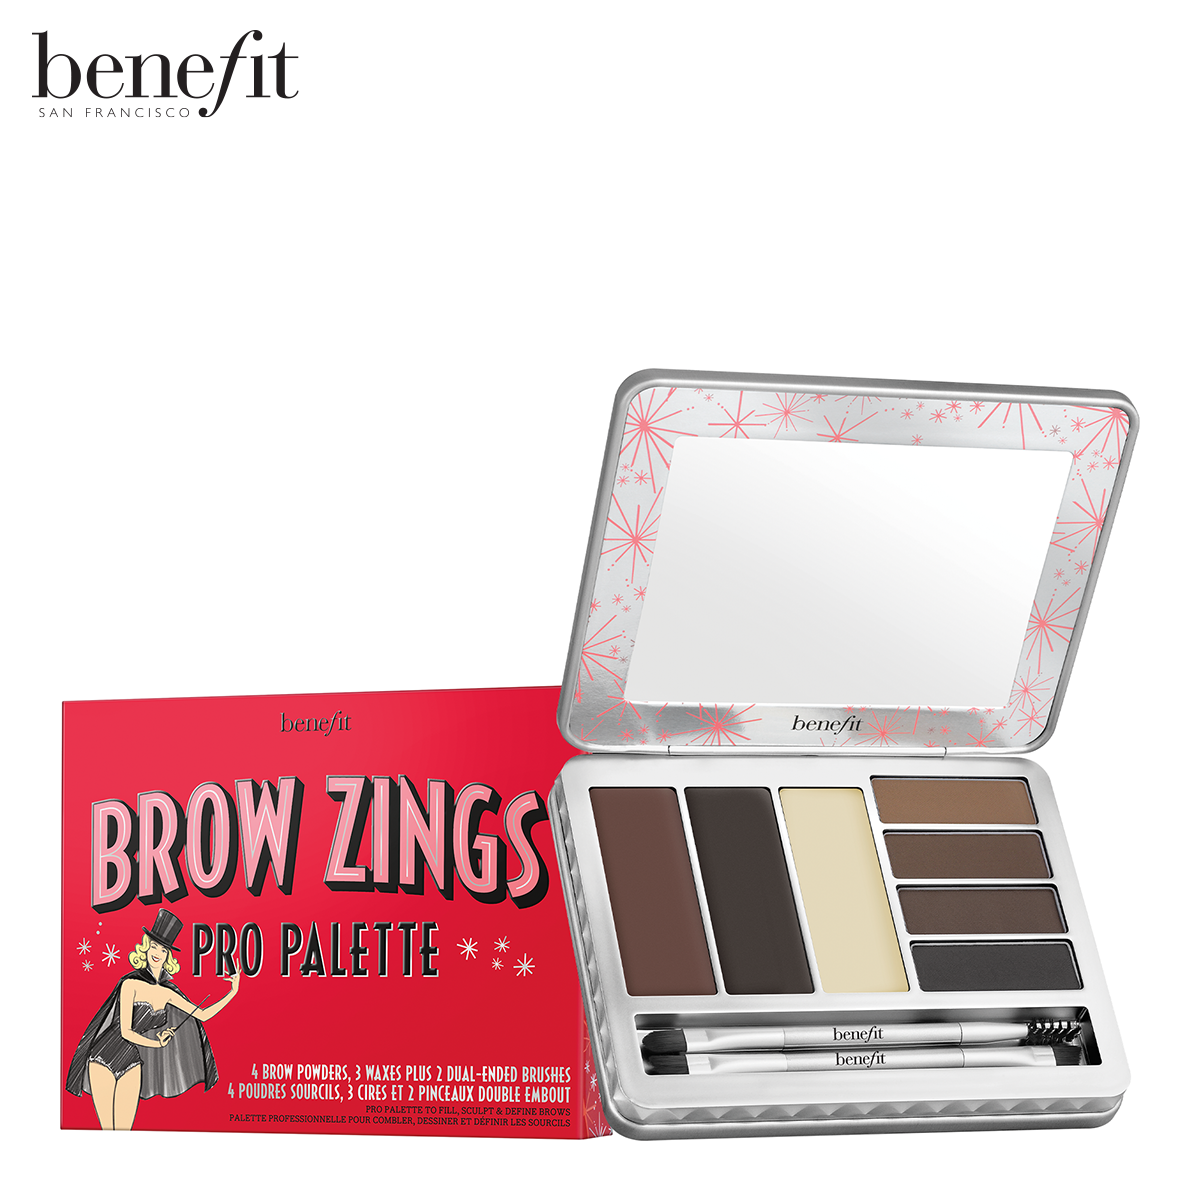 Benefit เบเนฟิต เซ็ตตกแต่งคิ้ว Brow Zings Pro Palette Eyebrow Wax And Powder.